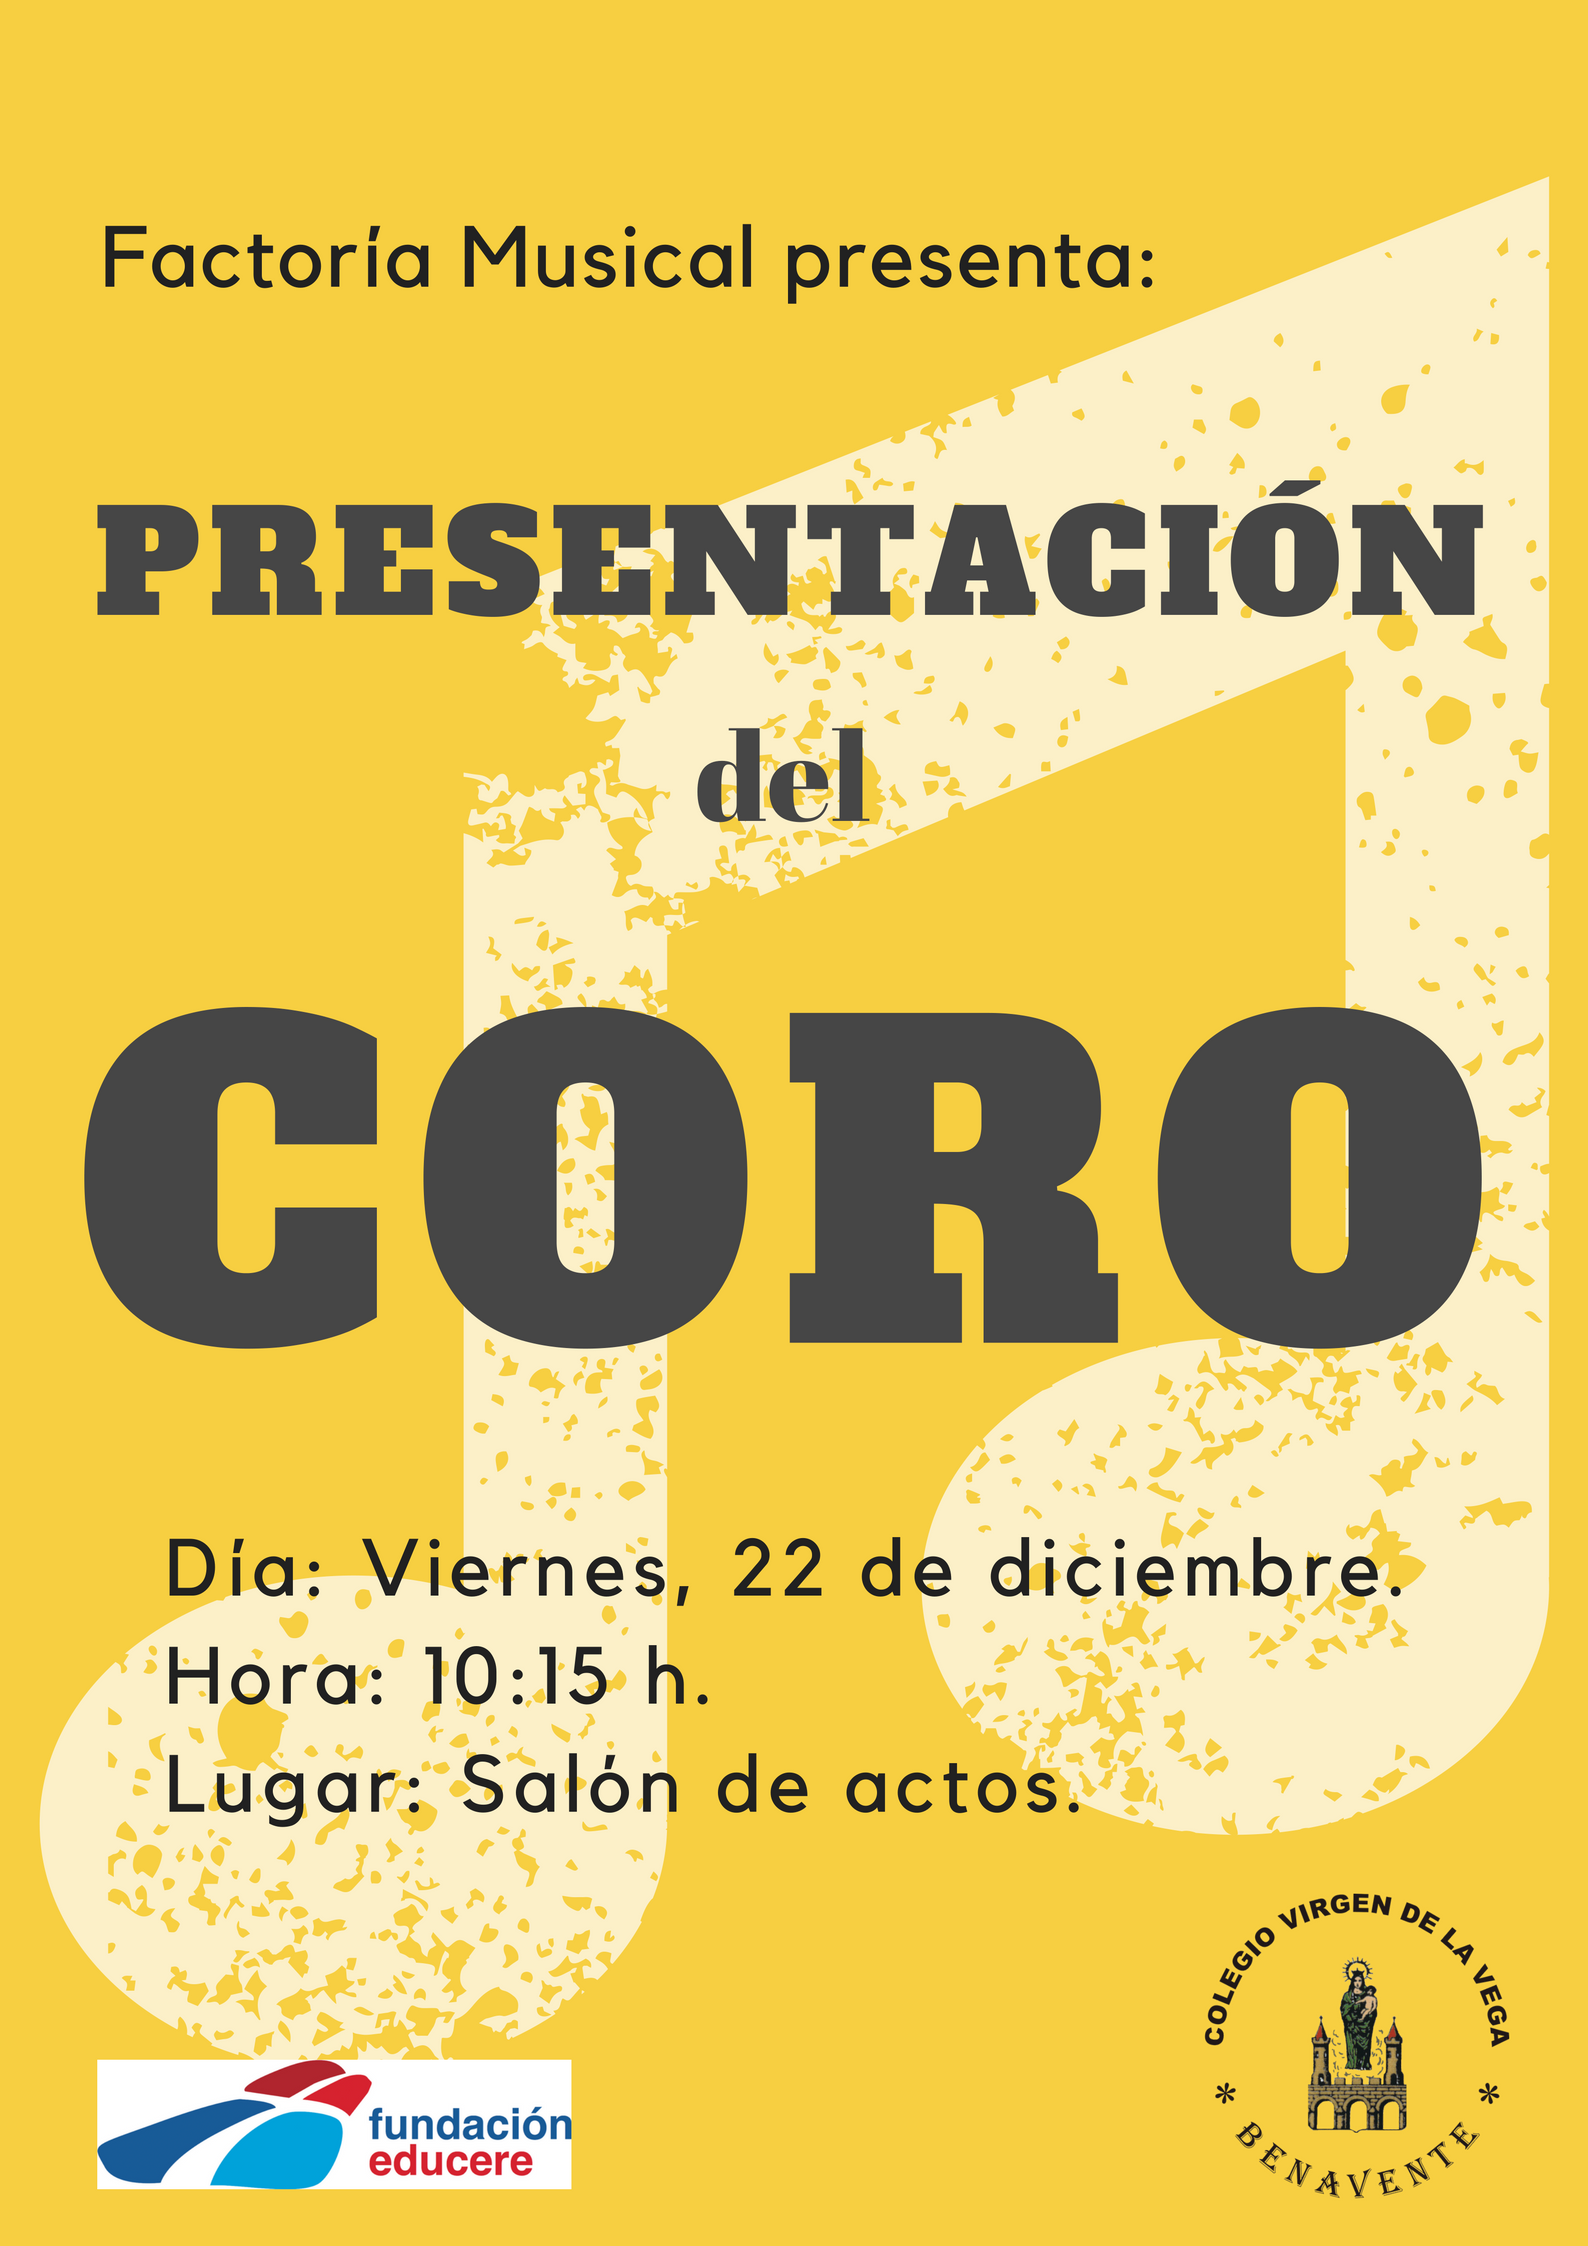 Copia_de_Factoría_Musical_presenta_